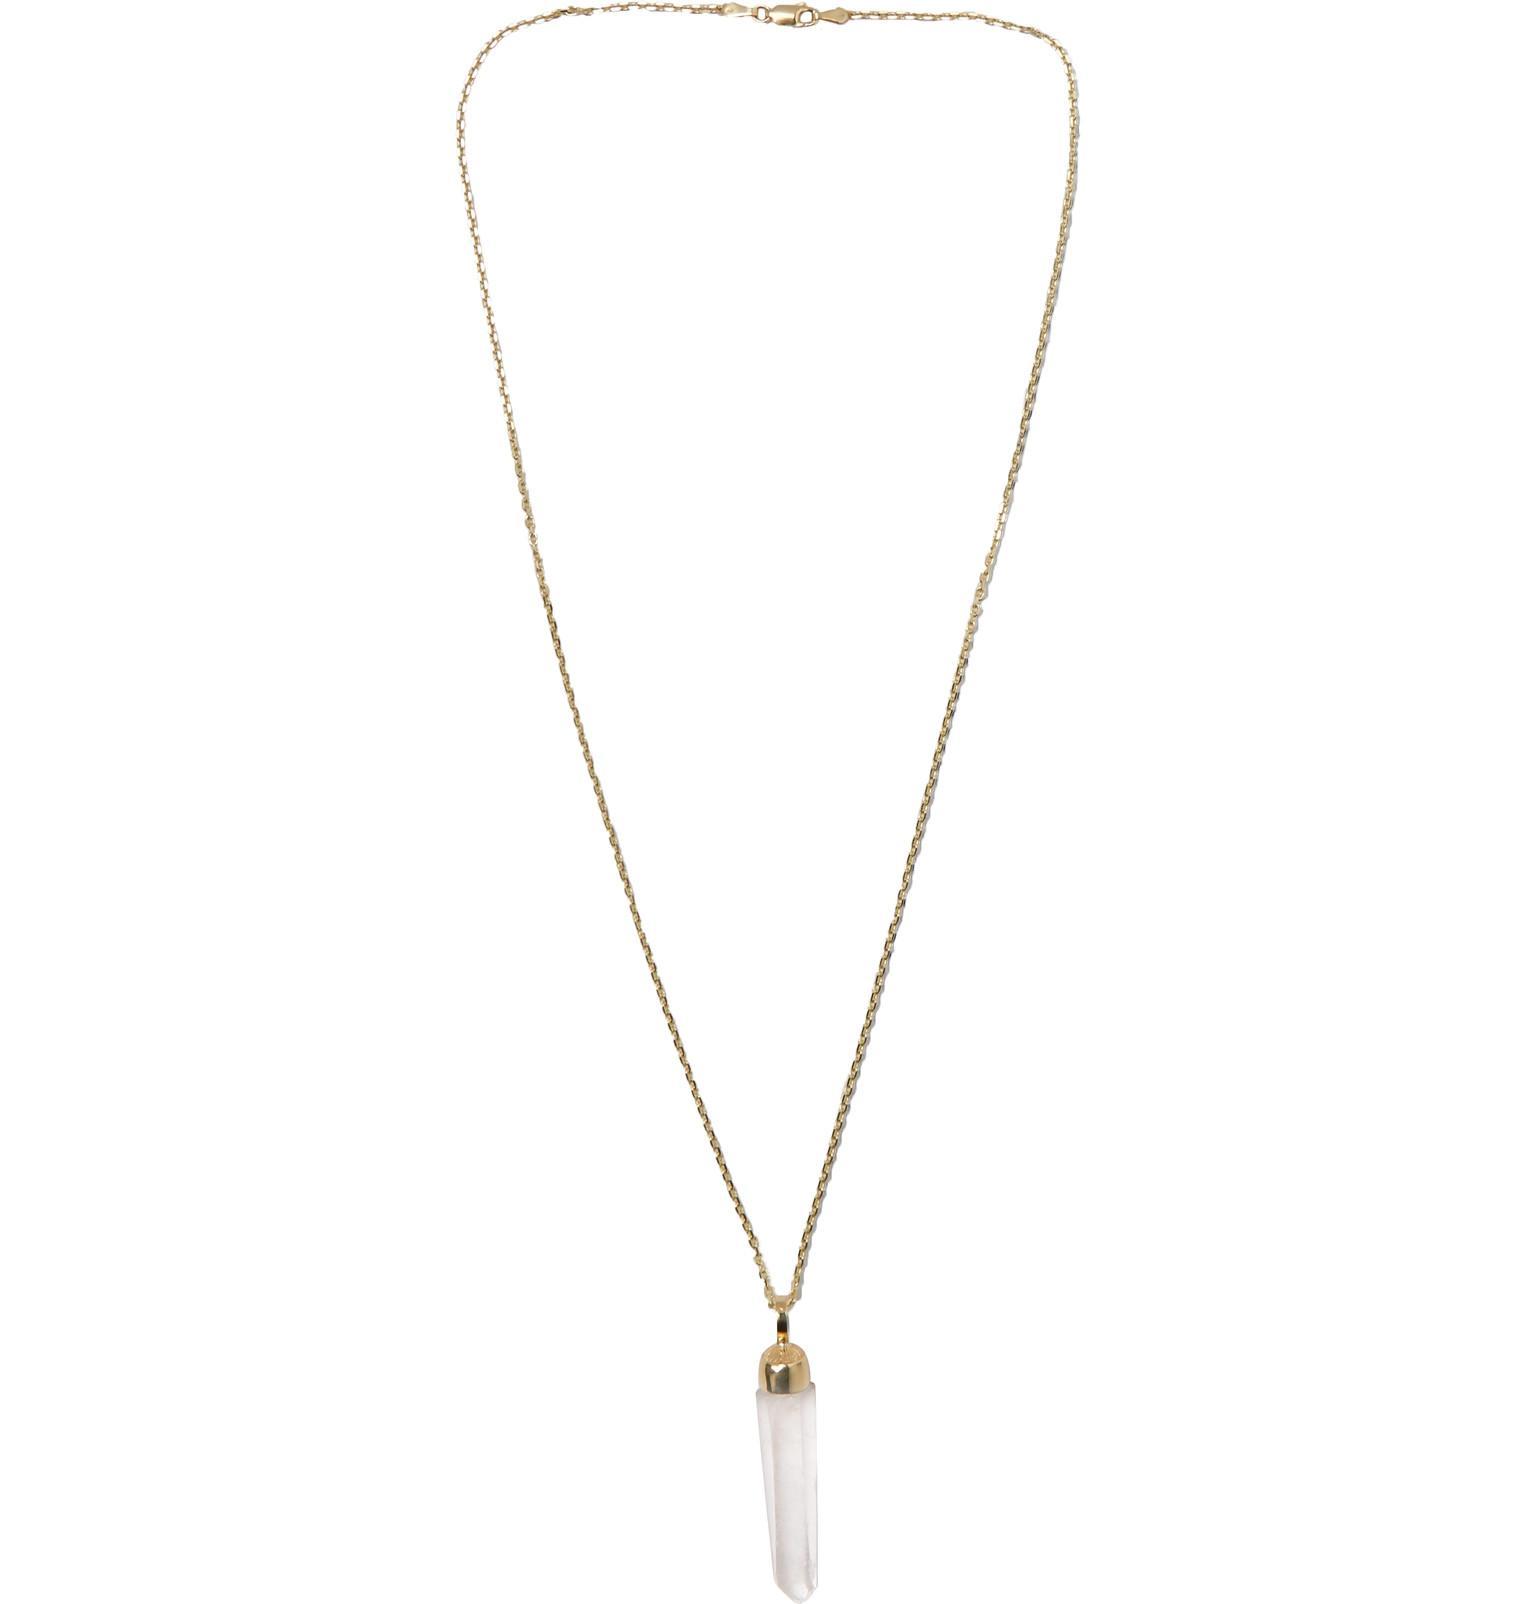 Luis Morais 14-karat Gold Crystal Necklace - Gold SBv9pVJX